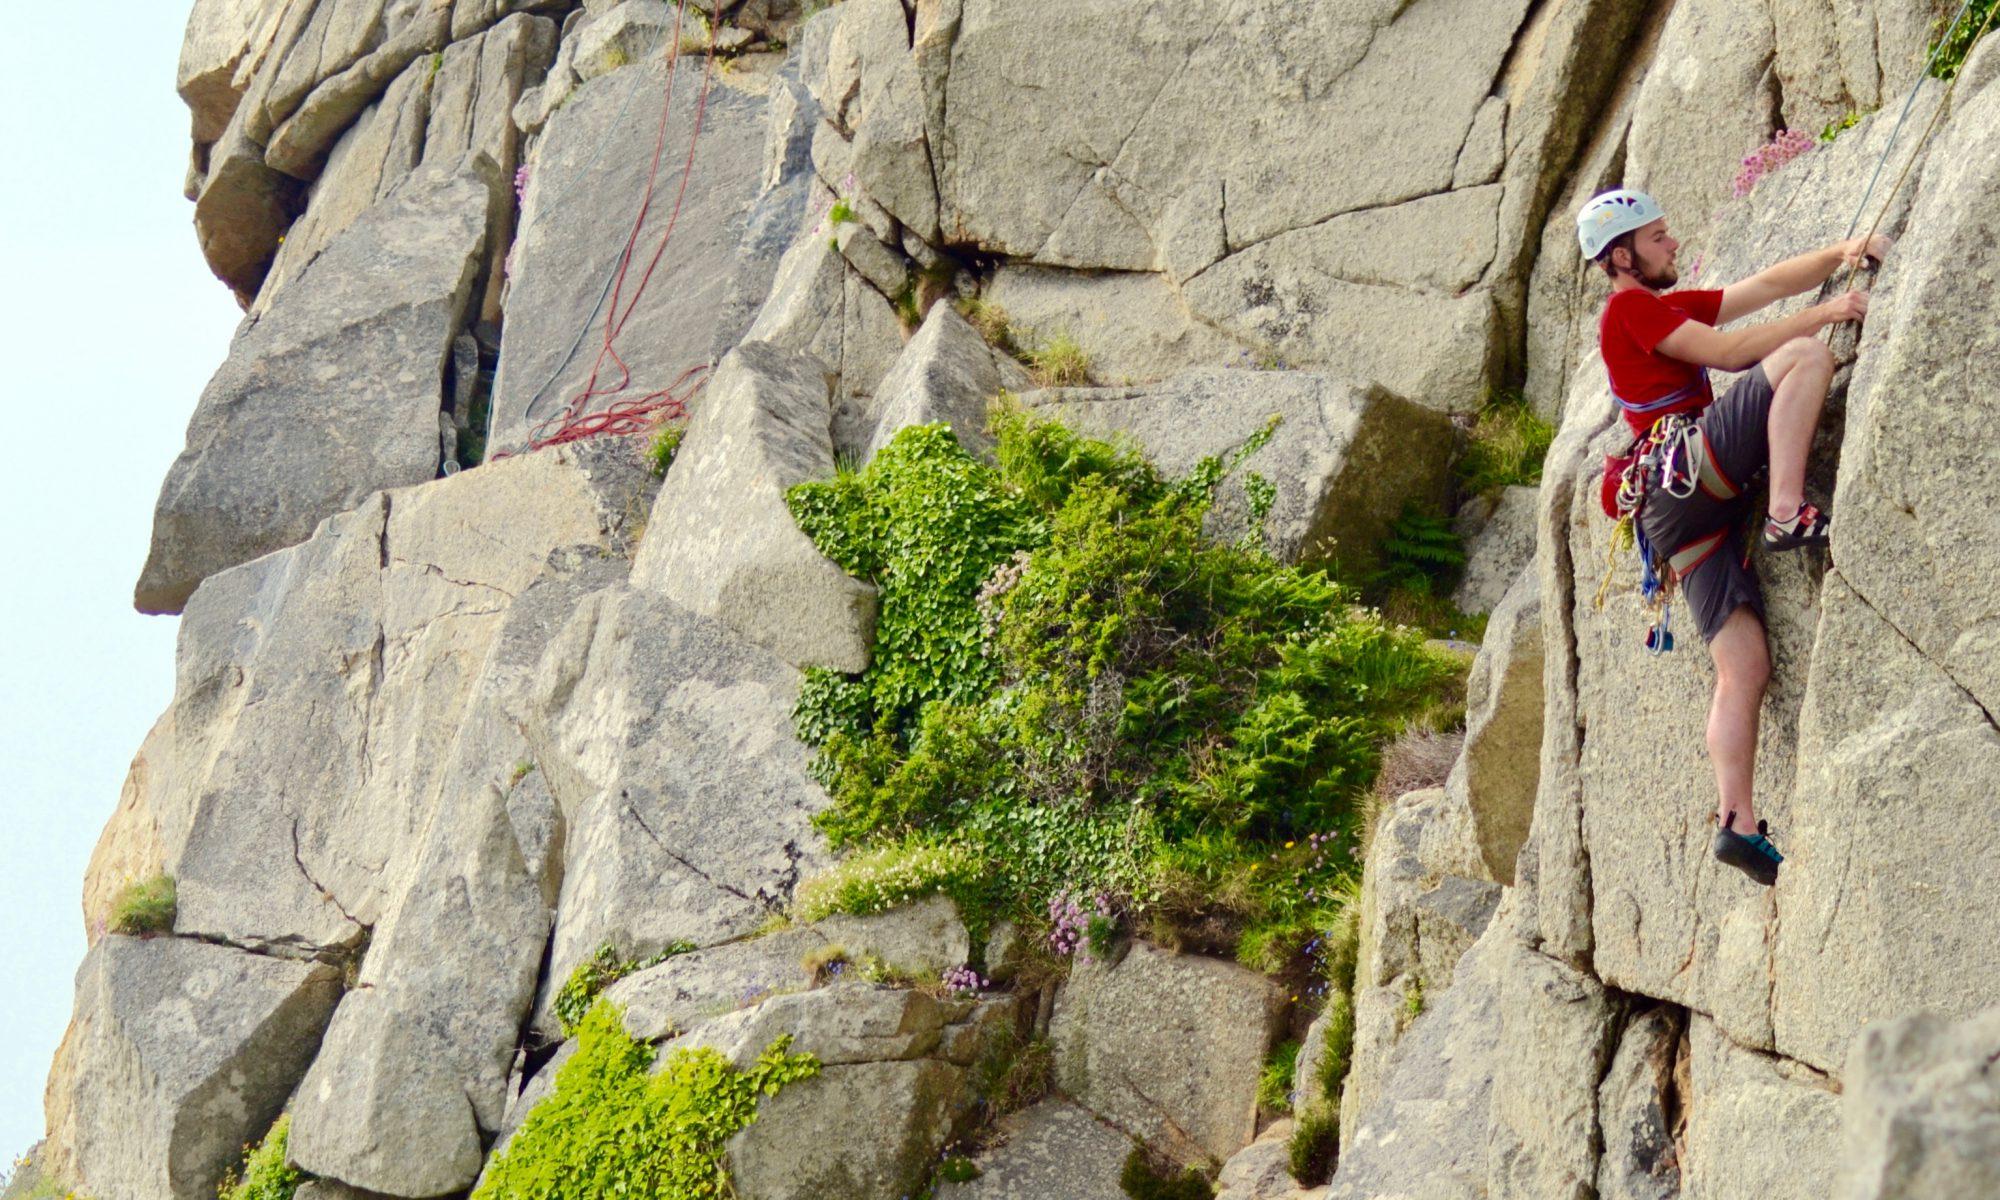 Exeter University Climbing Club